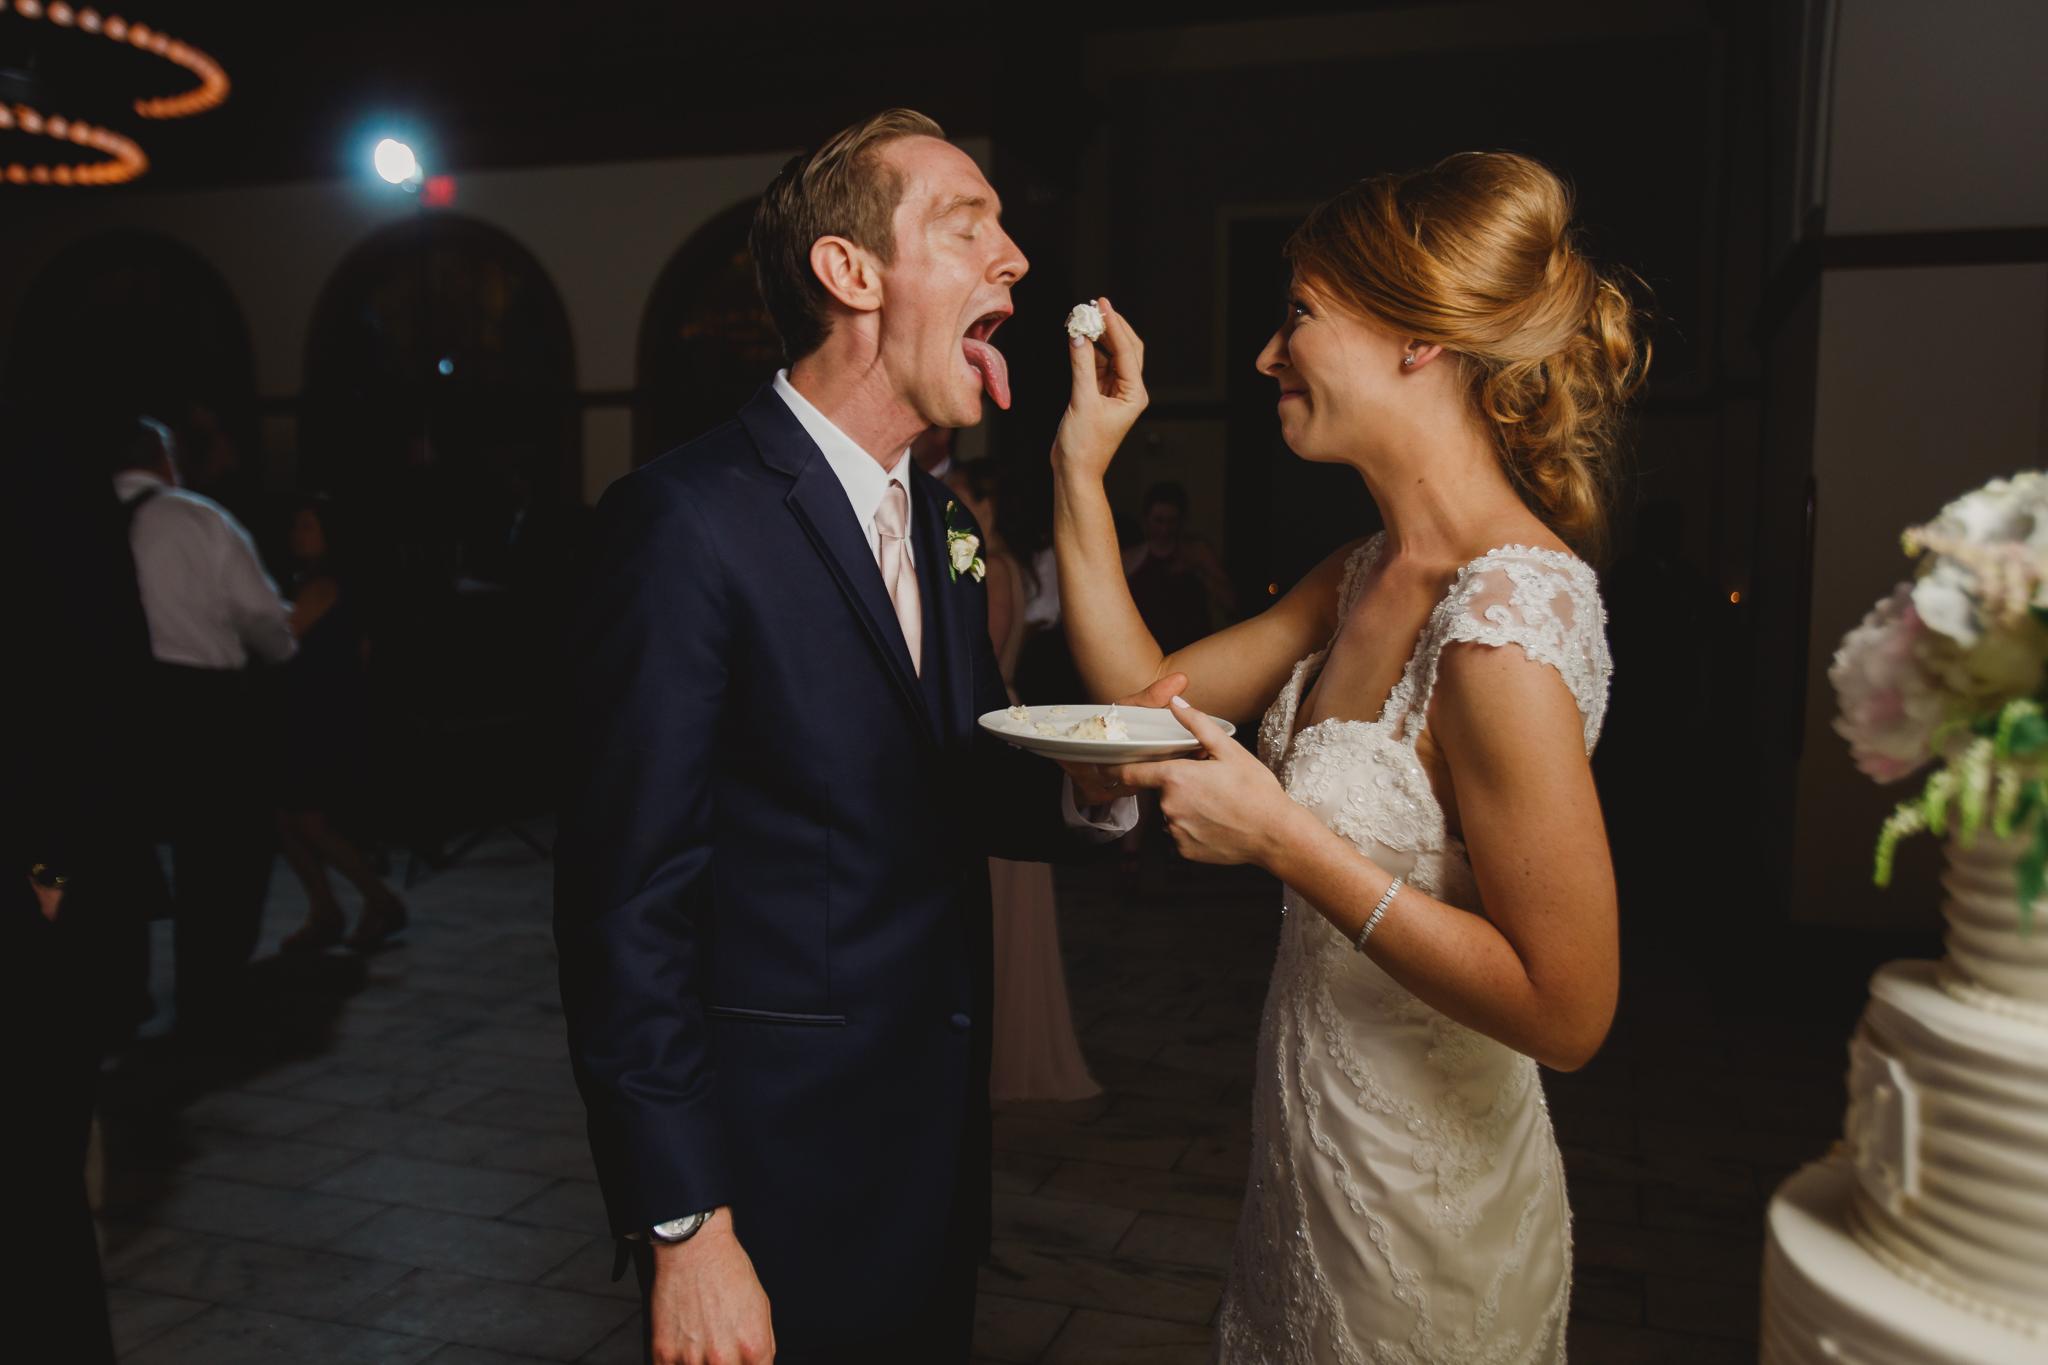 Michael and Kelly - the ashton depot - wedding DFW - wedding photographer- elizalde photography (119 of 150).jpg